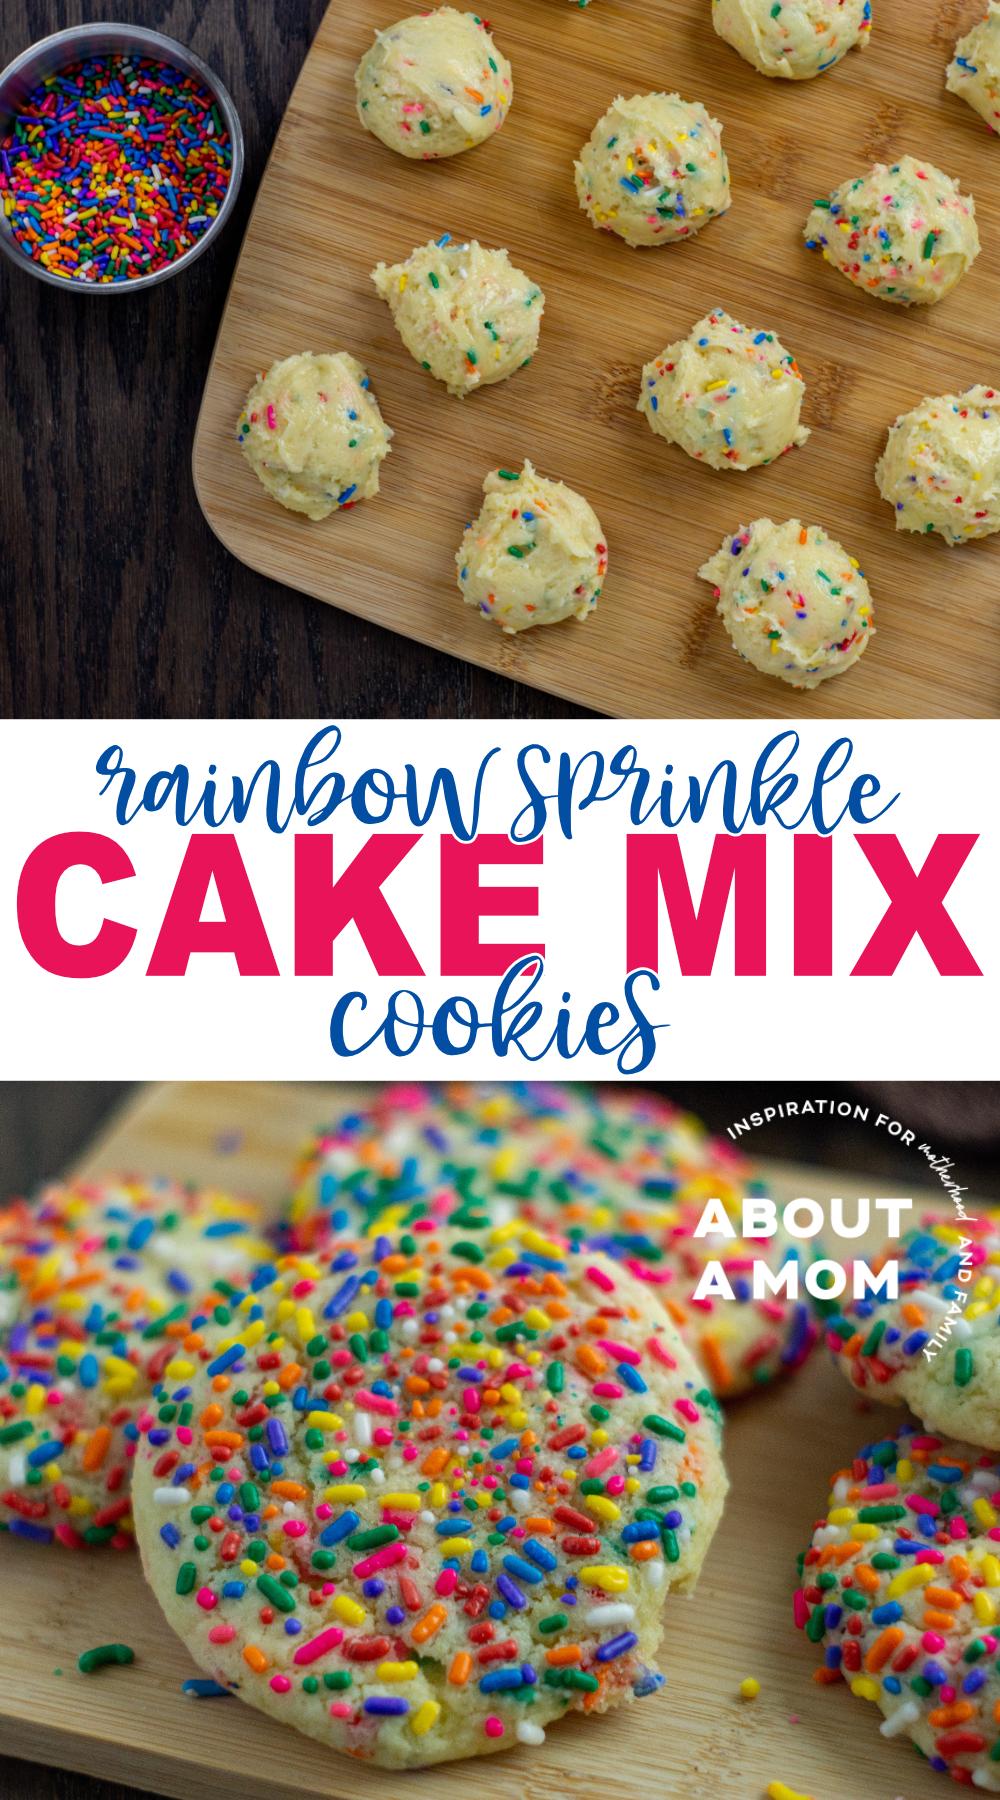 Rainbow Sprinkles White Cake Mix Cookies